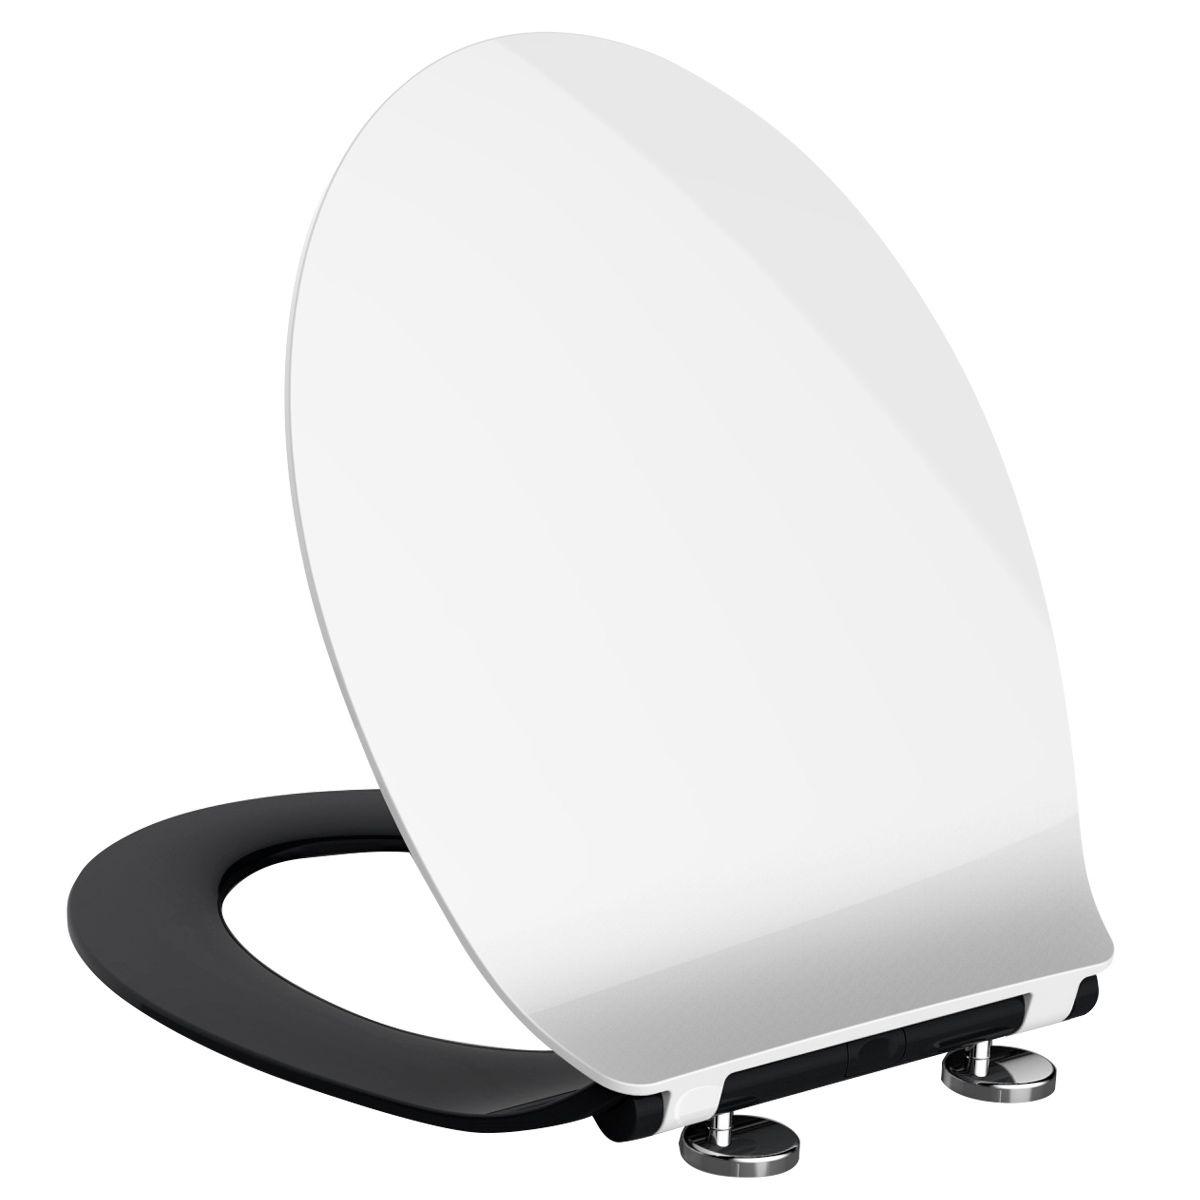 Deska Sedesowa Wolnoopadajaca Slim Sense Czarna 7244310208 Oficjalne Archiwum Allegro Mirror Table Decor Furniture